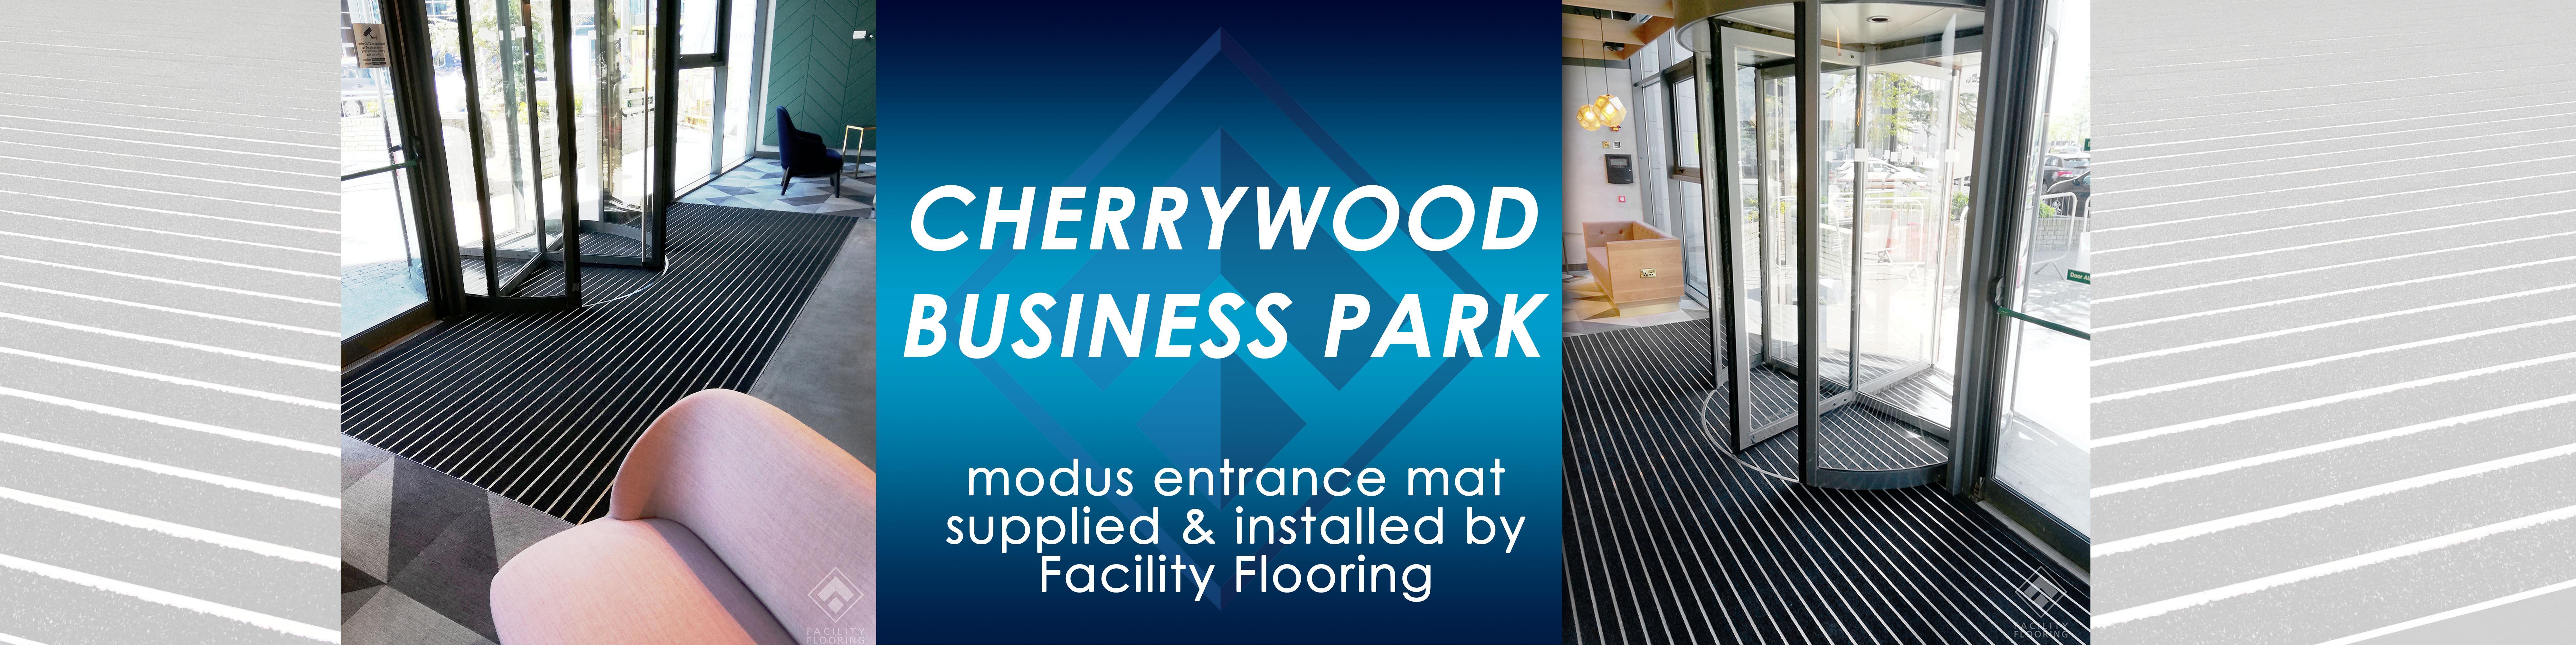 Cherrywood-Modus